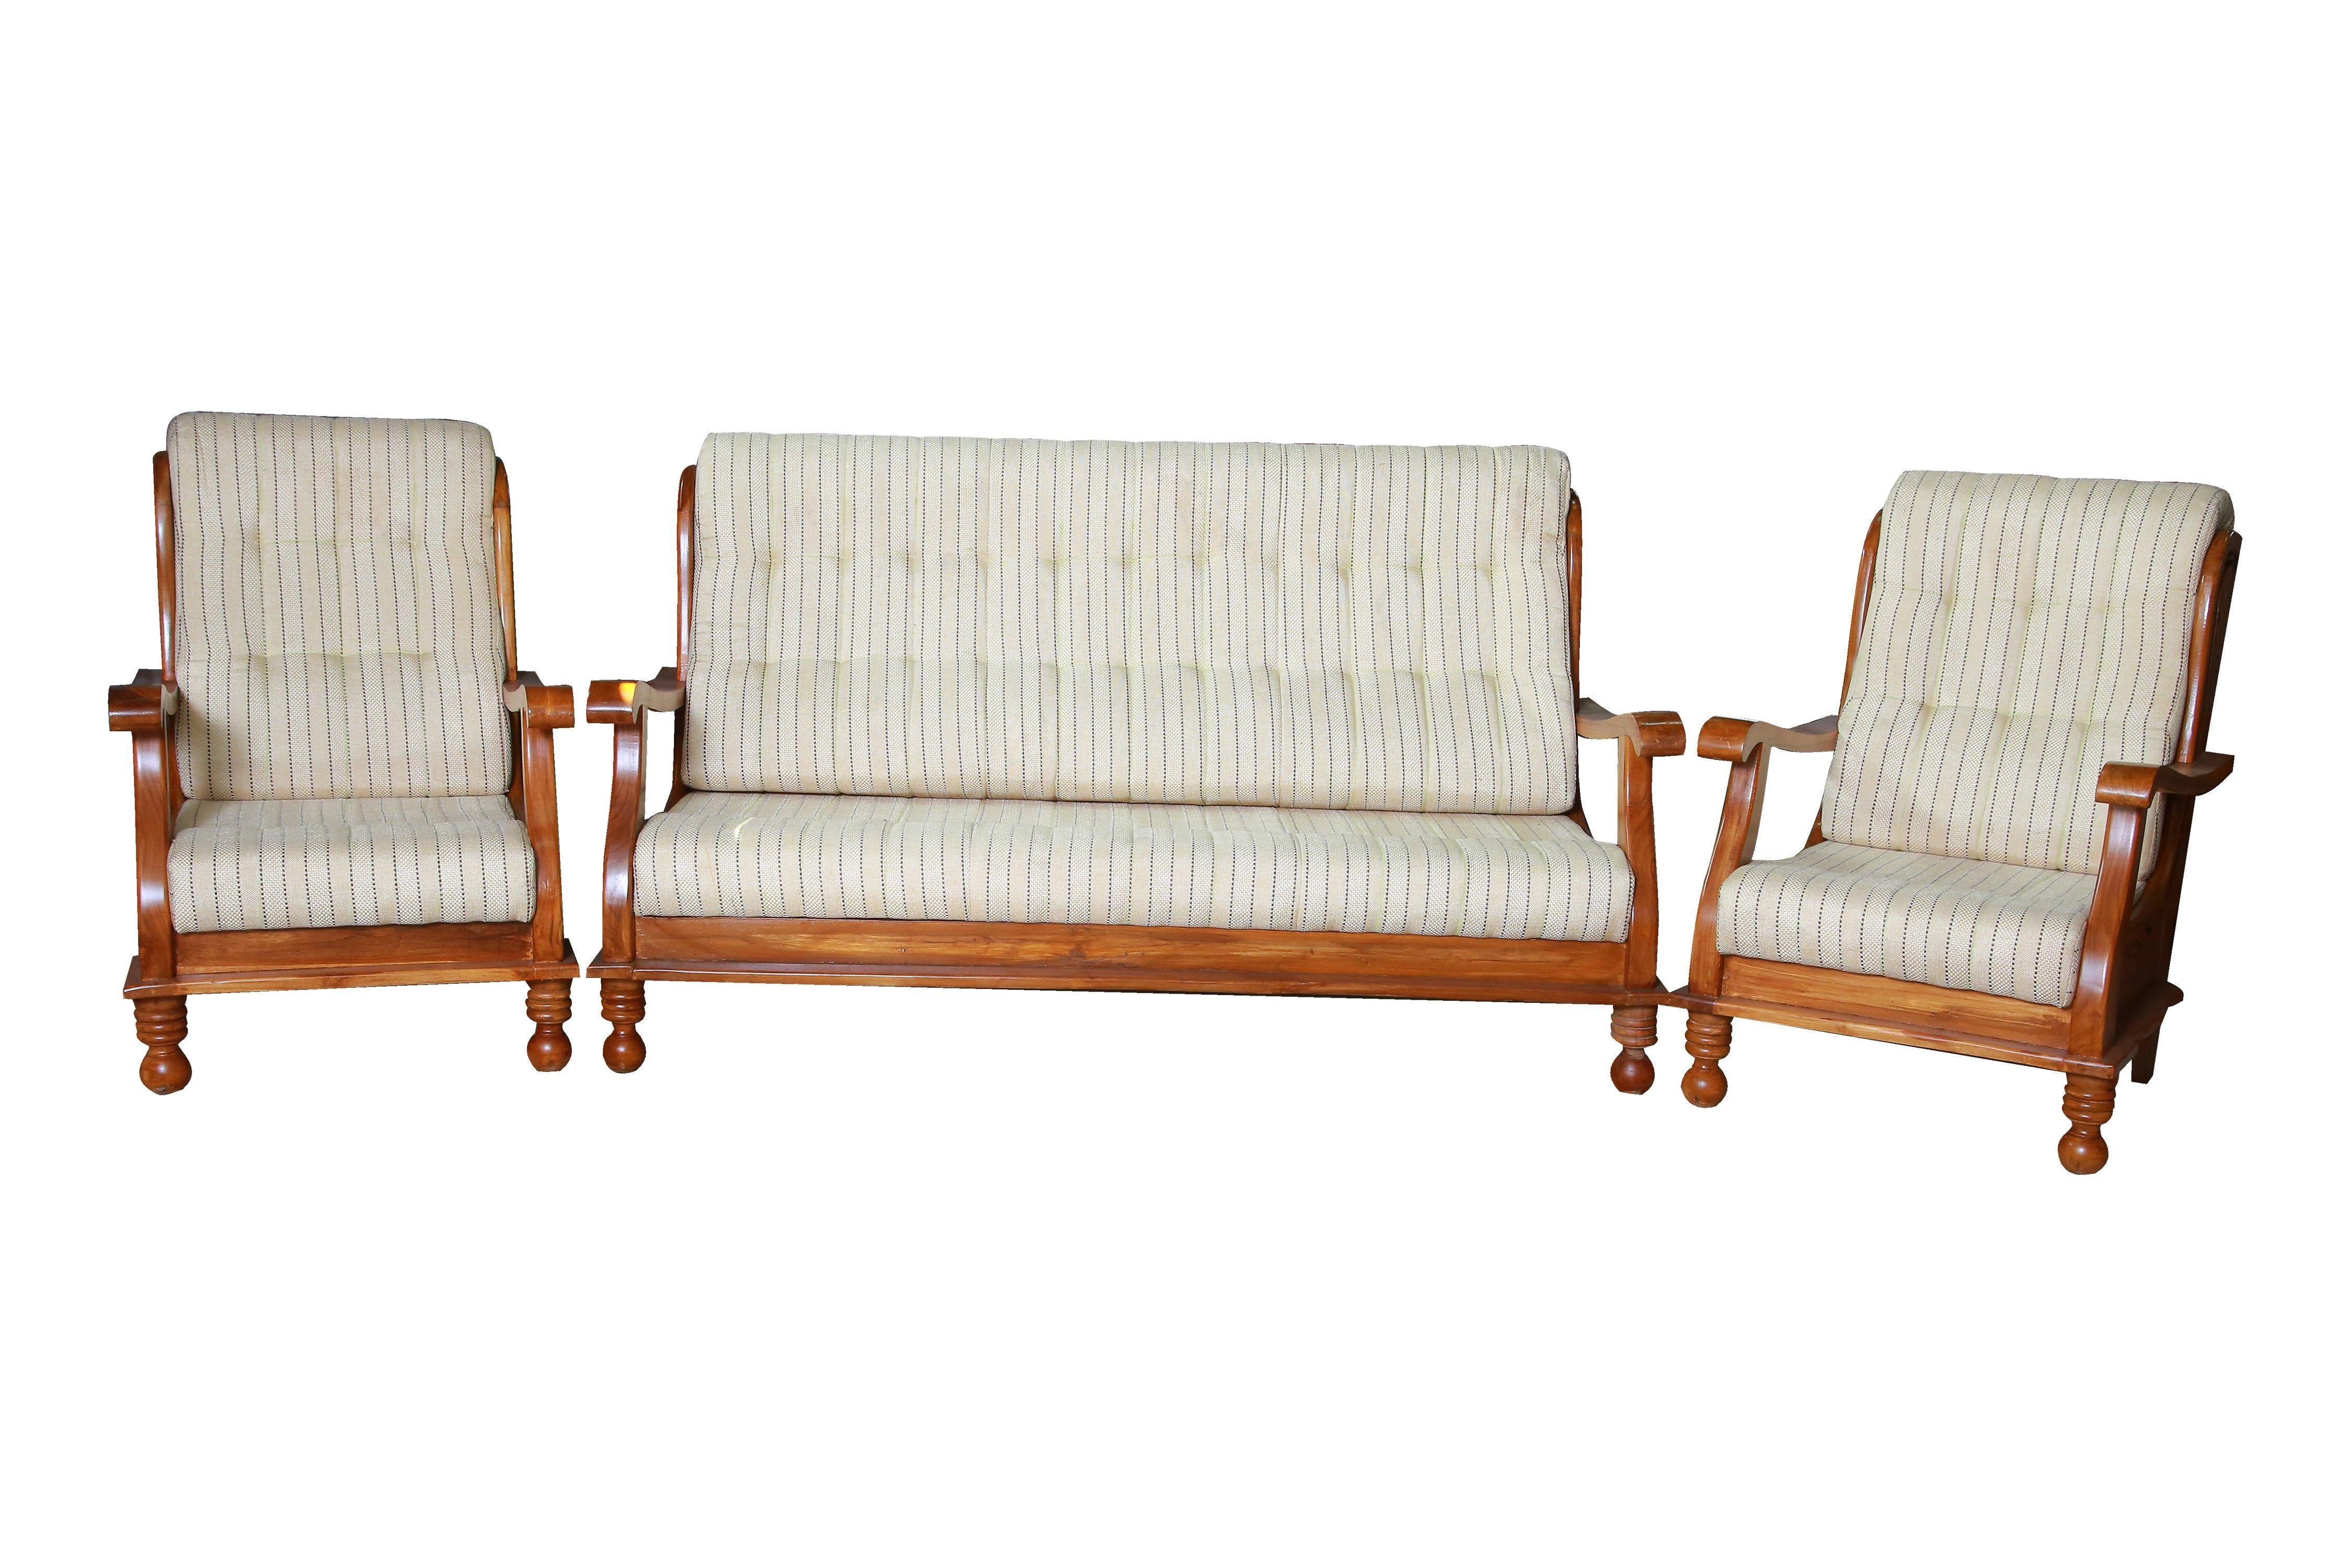 Cairo Teak Wood Sofa Set 3 1 1 Seater Sofa Design Furniture Wood Sofa